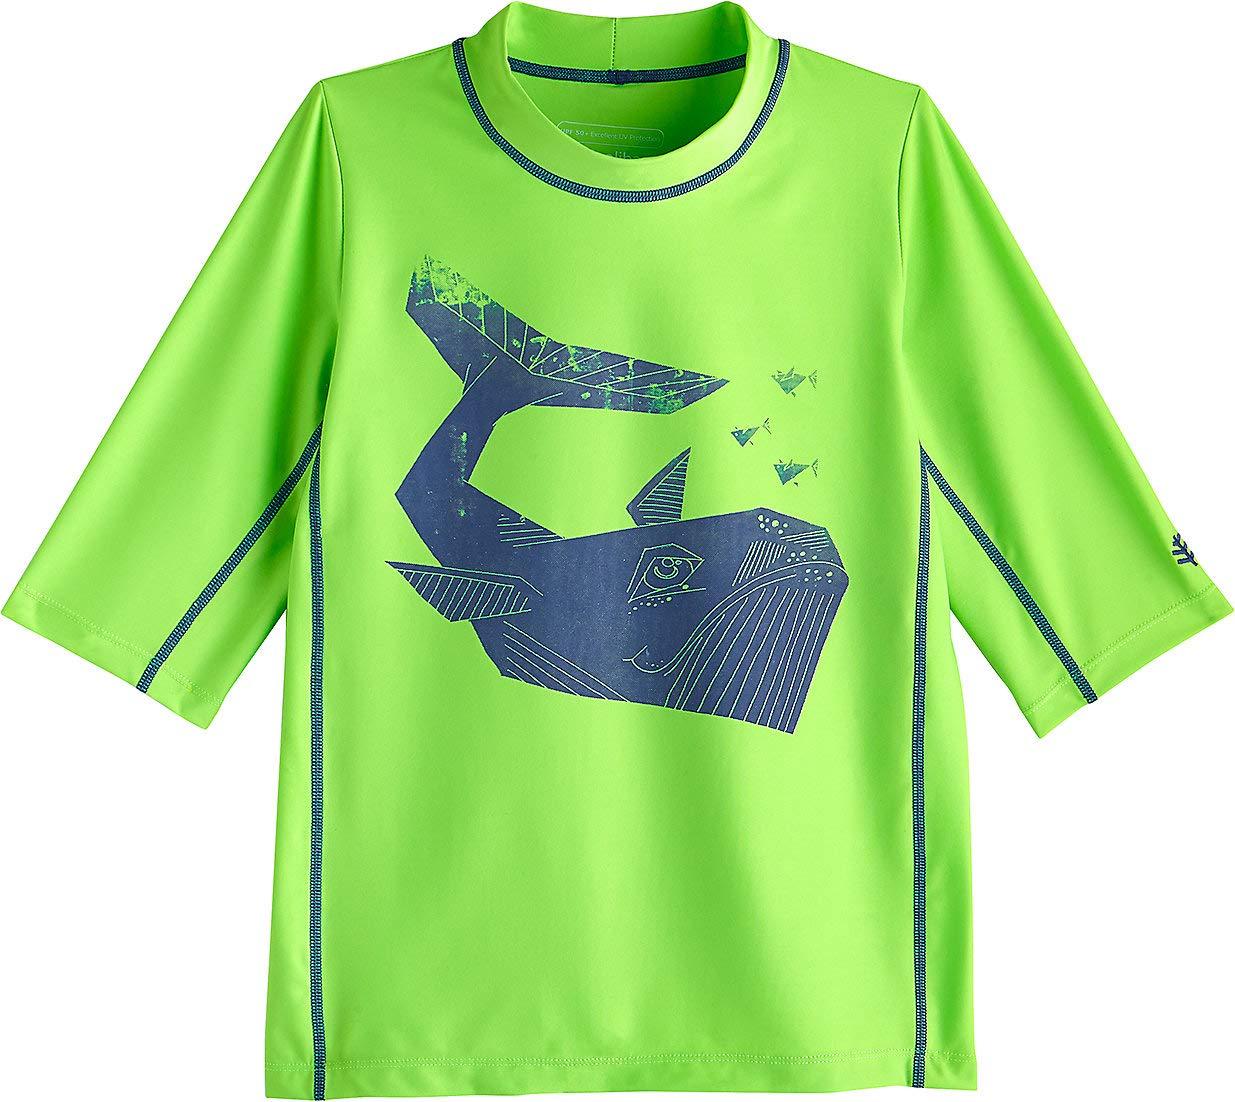 Coolibar UPF 50+ Kid's Sandshark Short Sleeve Surf Shirt - Sun Protective